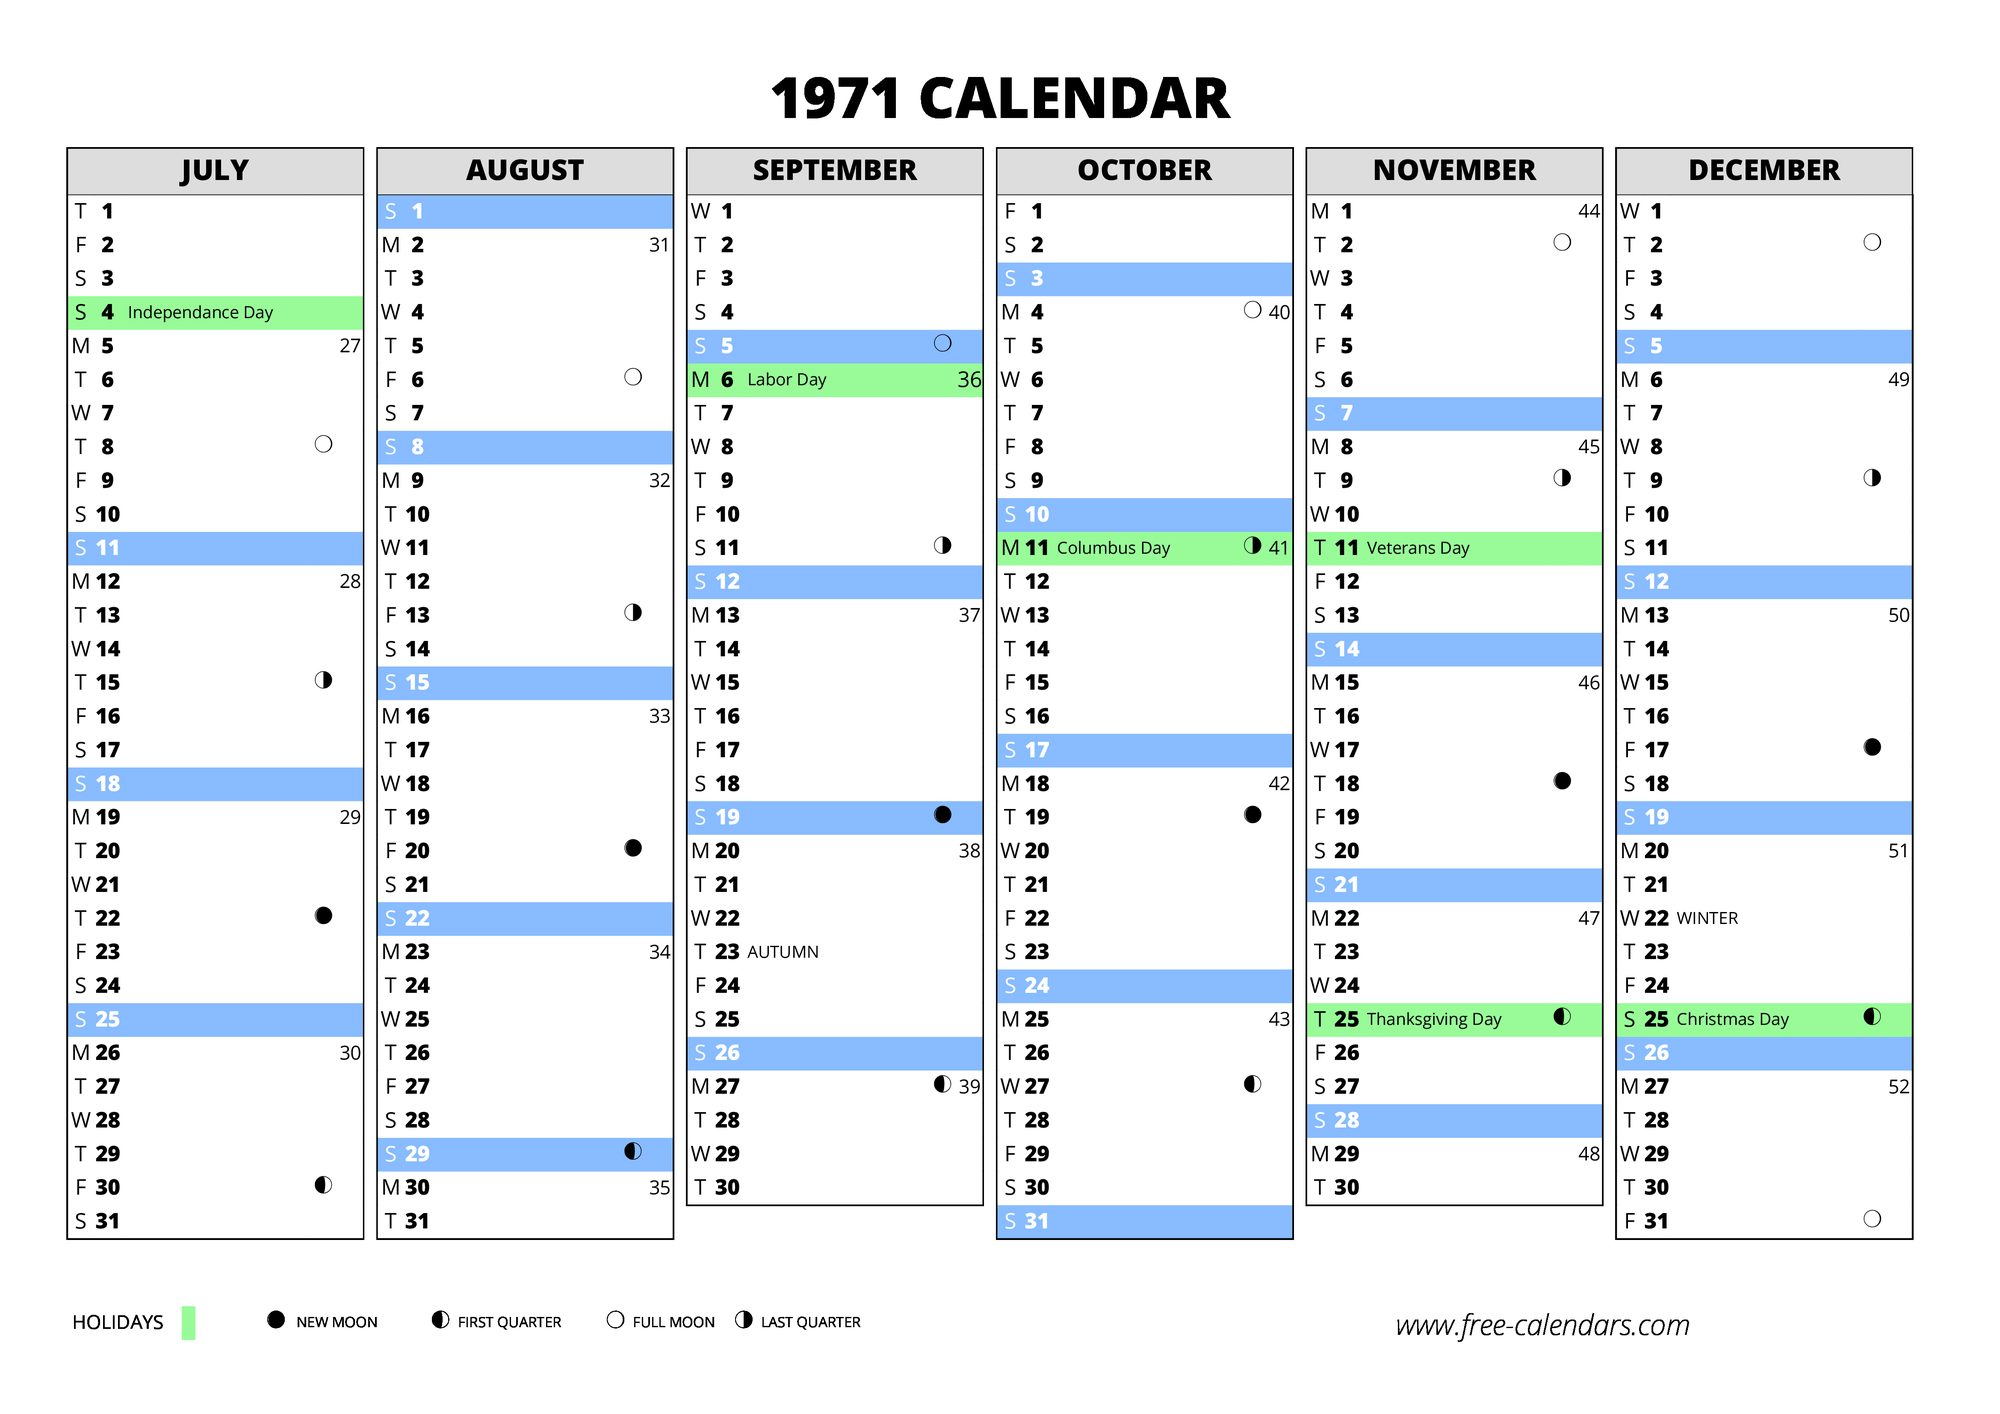 December Moon Calendar >> 1971 calendar ≡ free-calendars.com